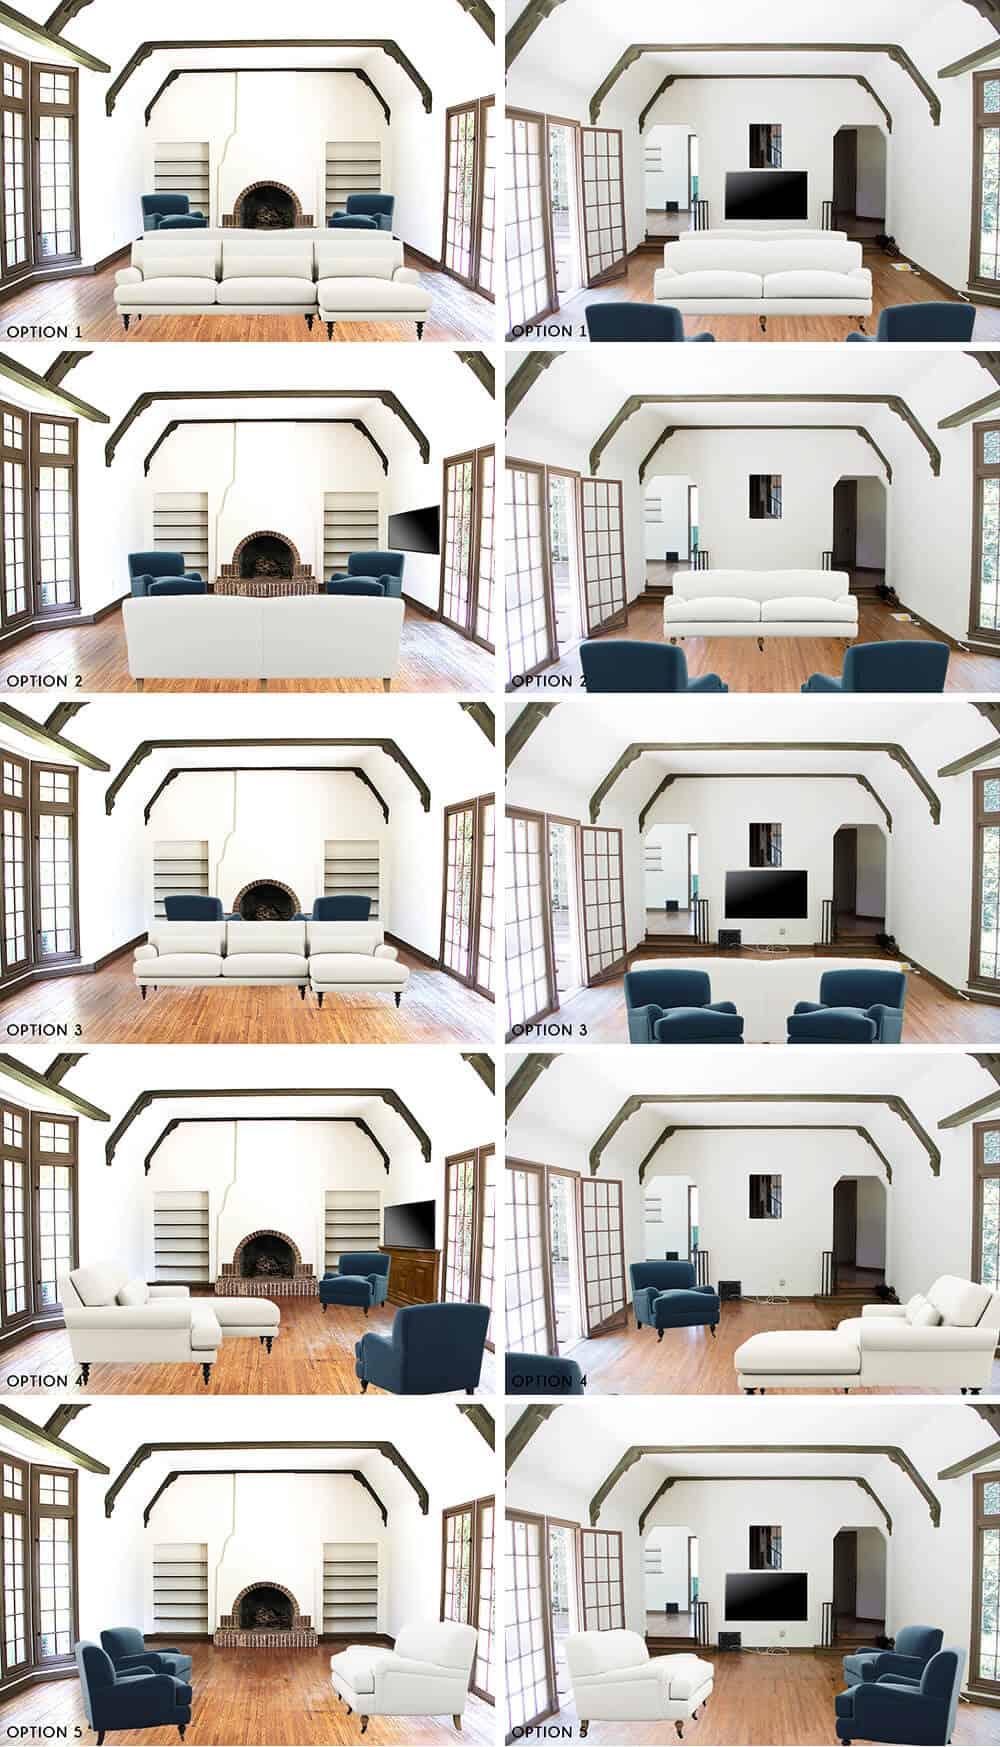 emily-henderson_renovation_home-imporovement_spanish_tudor_living-room_furniture-layout_grid